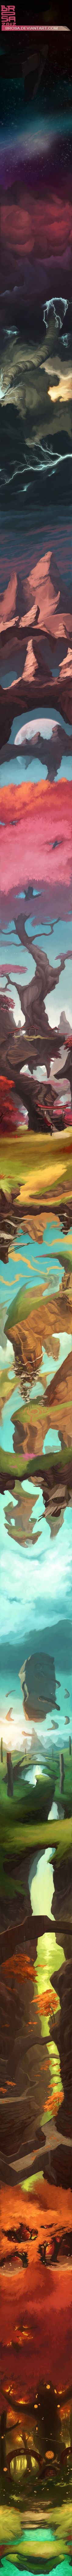 Illustration by Sergi Brosa. One long, continuous illustration. Illustration Manga, Illustrations, Animation, Environmental Art, Storyboard, Game Art, Amazing Art, Dragons, Fantasy Art